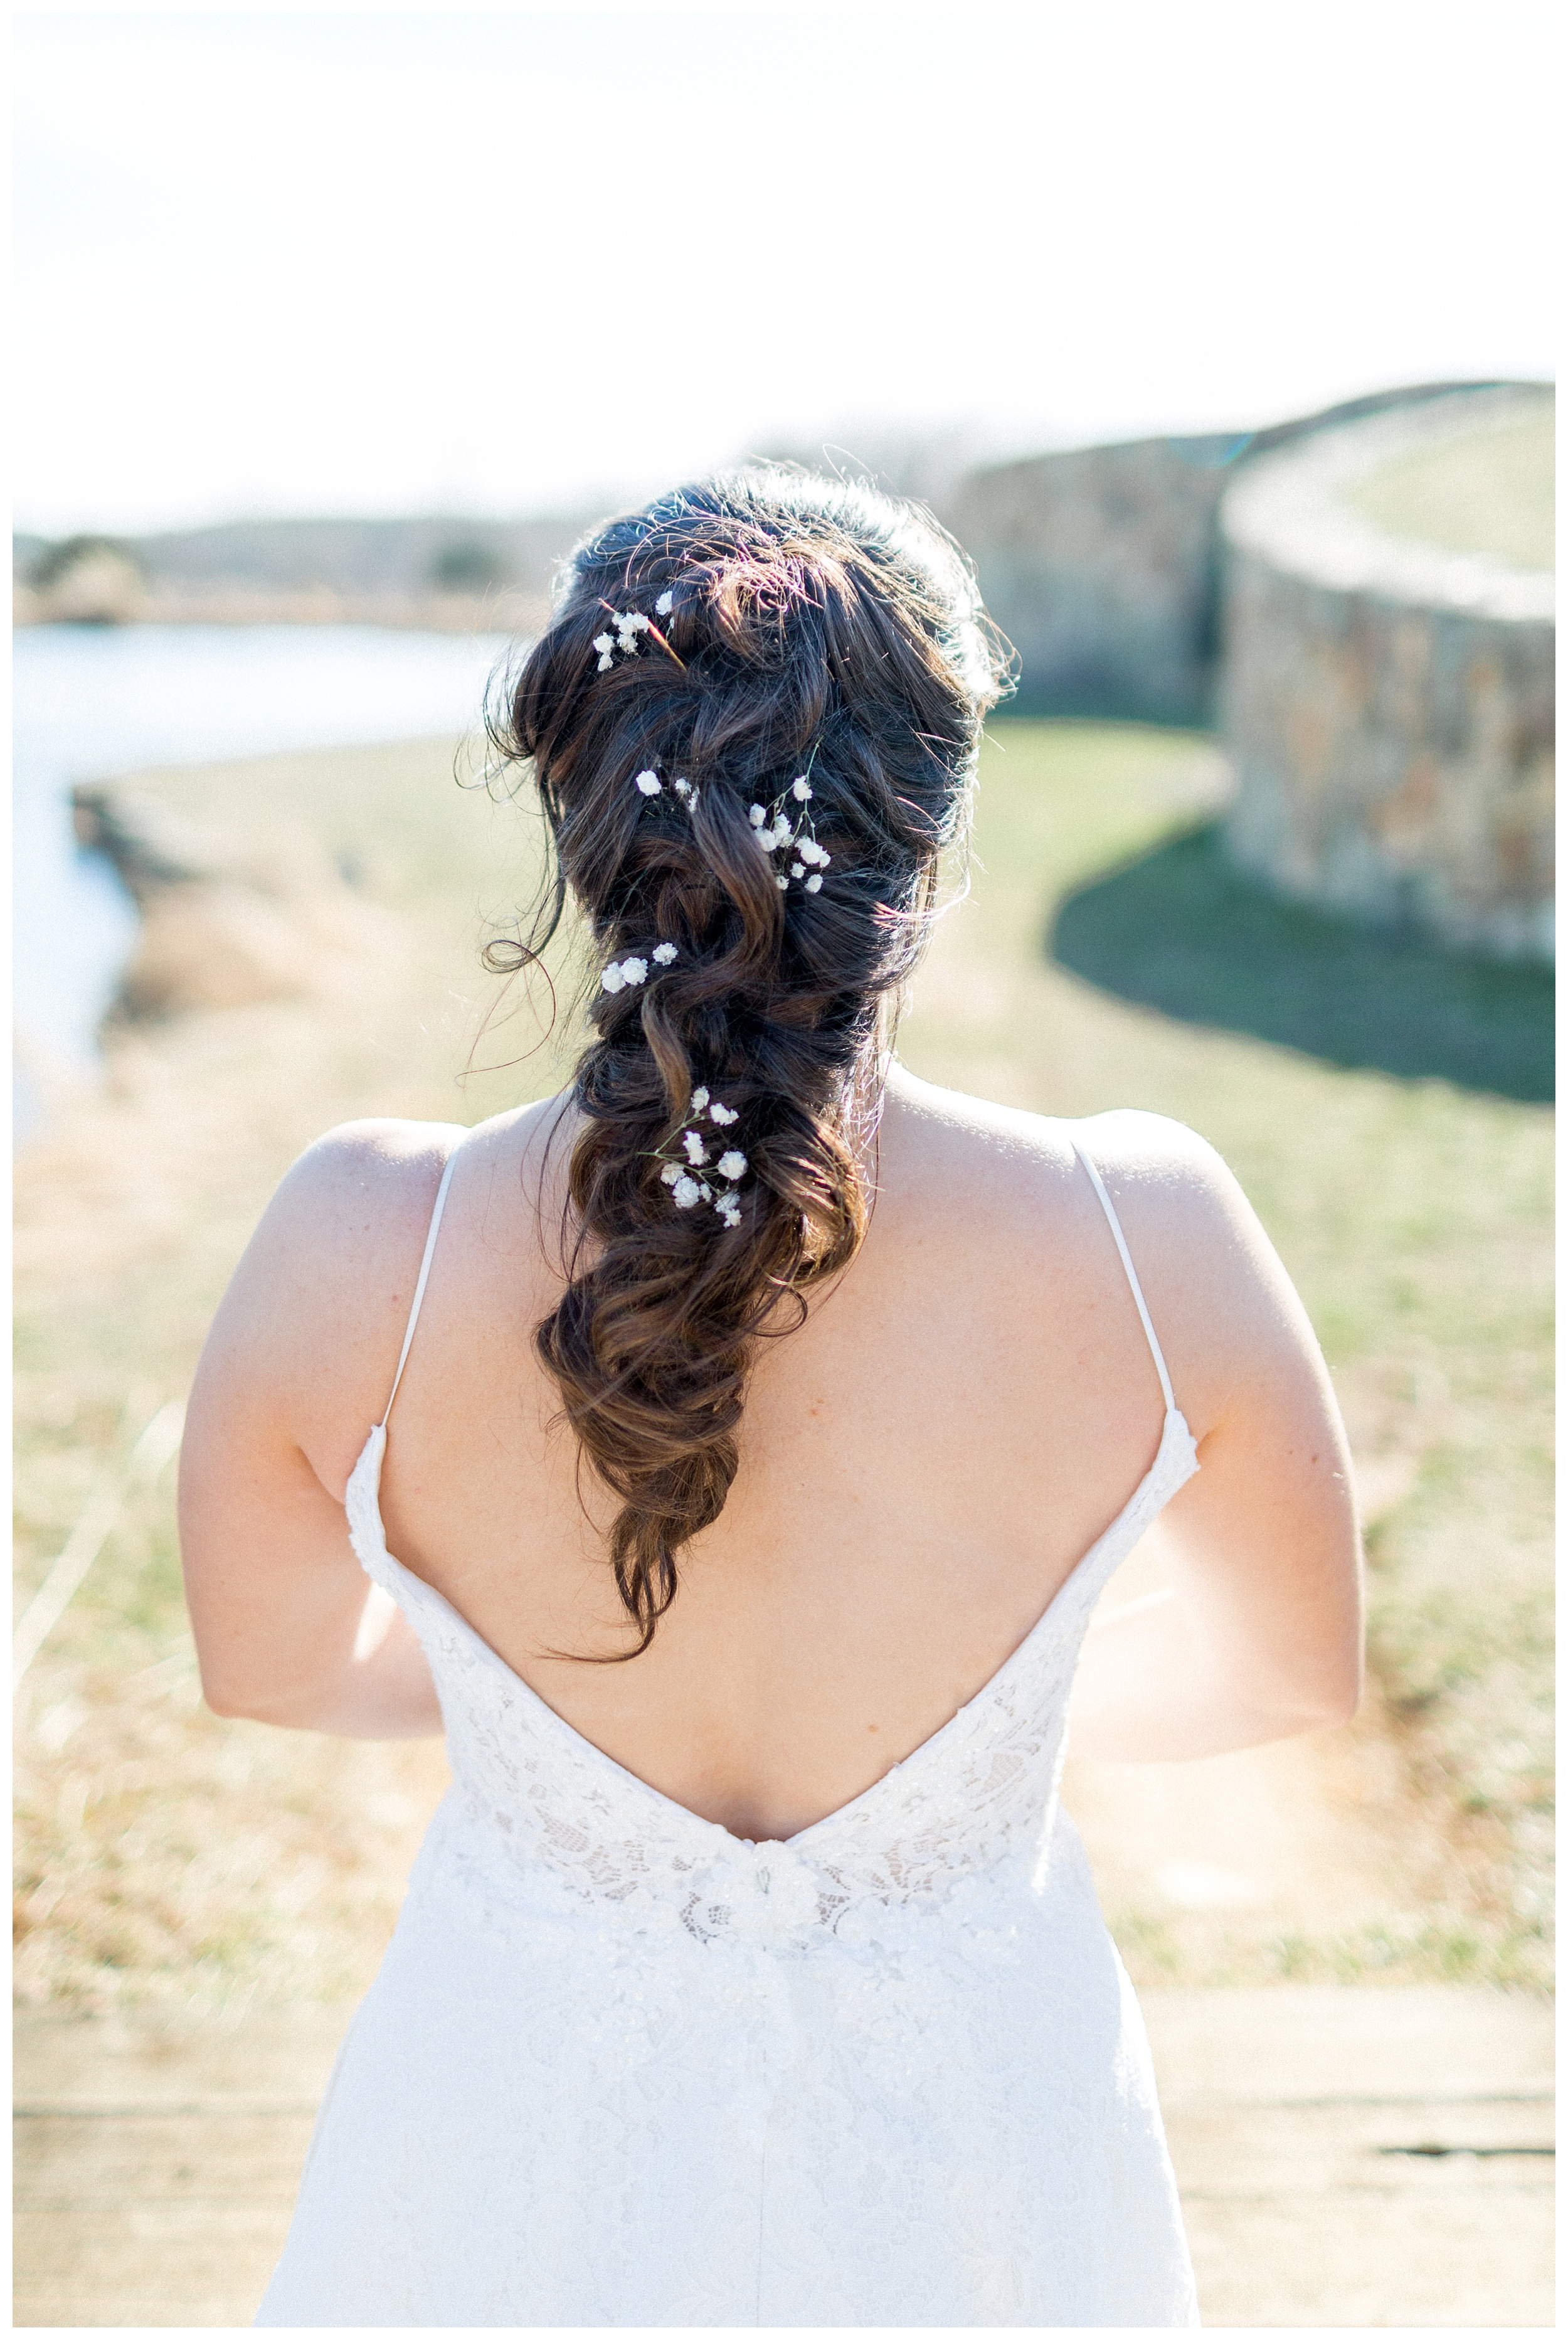 Stone Tower Winery Wedding | Virginia Winter Wedding | VA Wedding Photographer Kir Tuben_0056.jpg